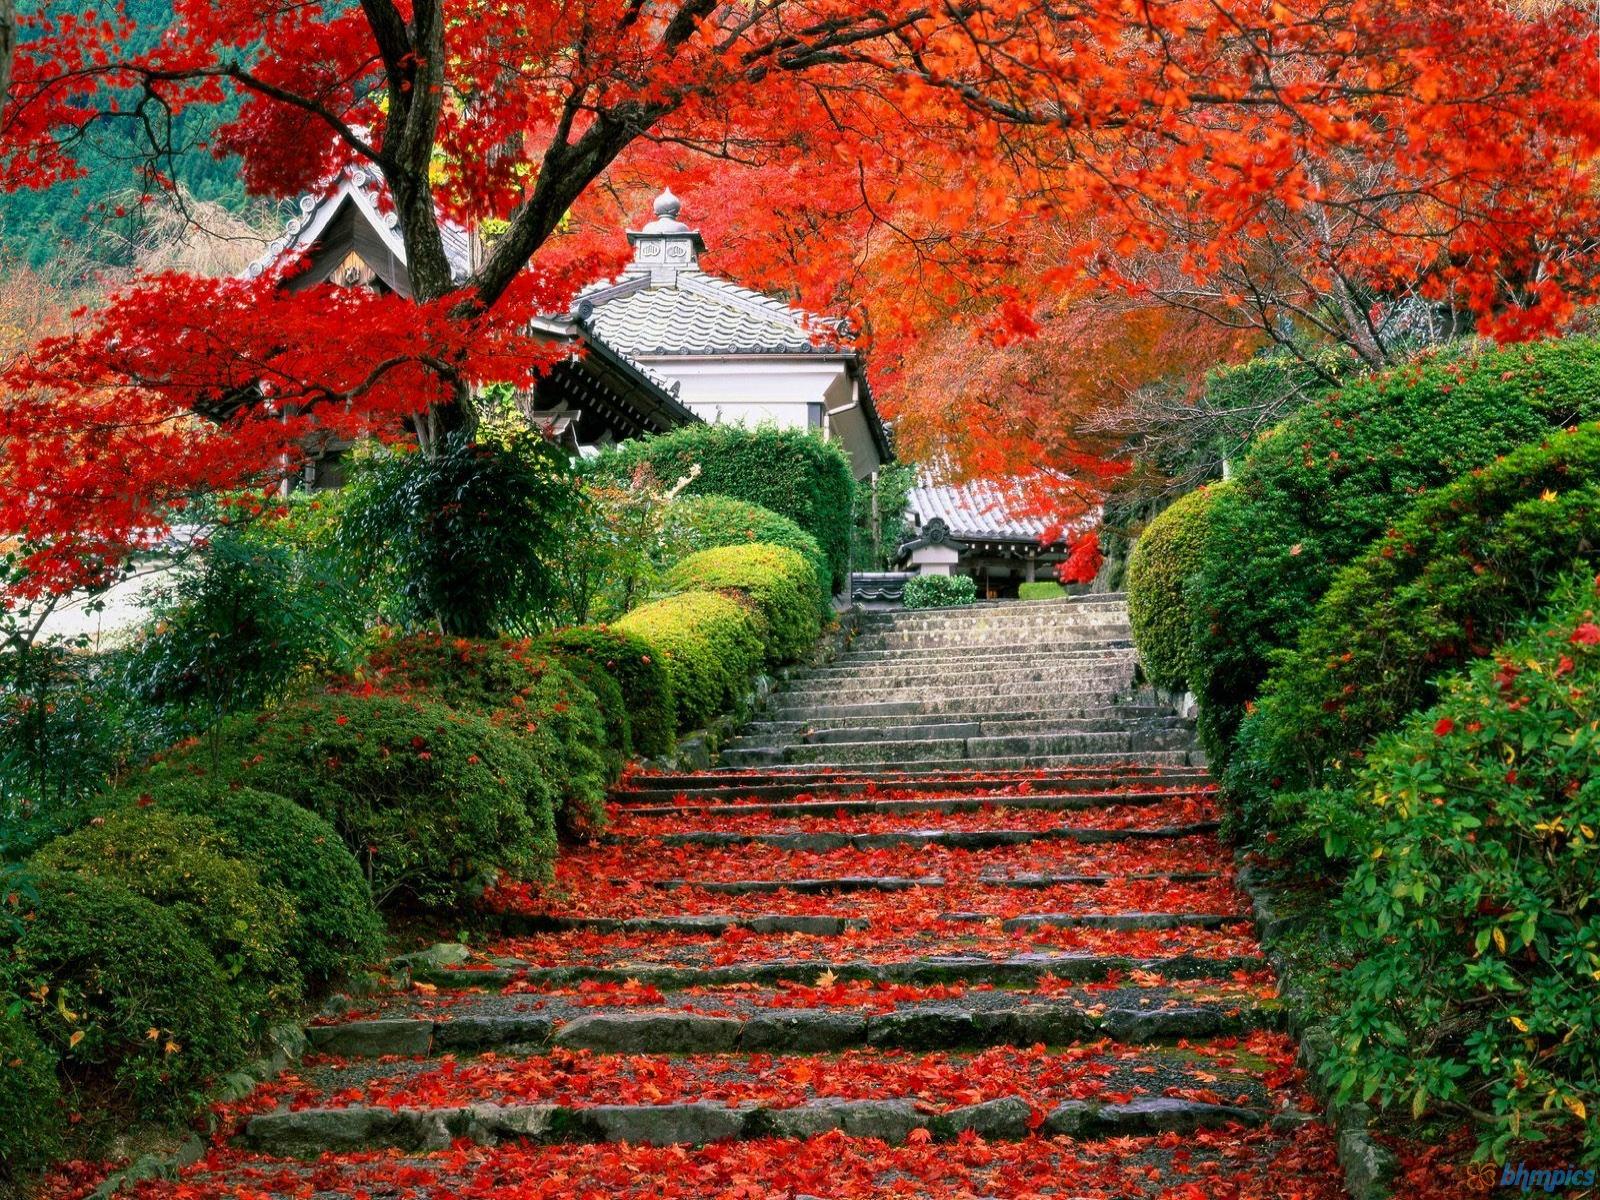 Hình nền mùa thu Autumngardenstaircase16